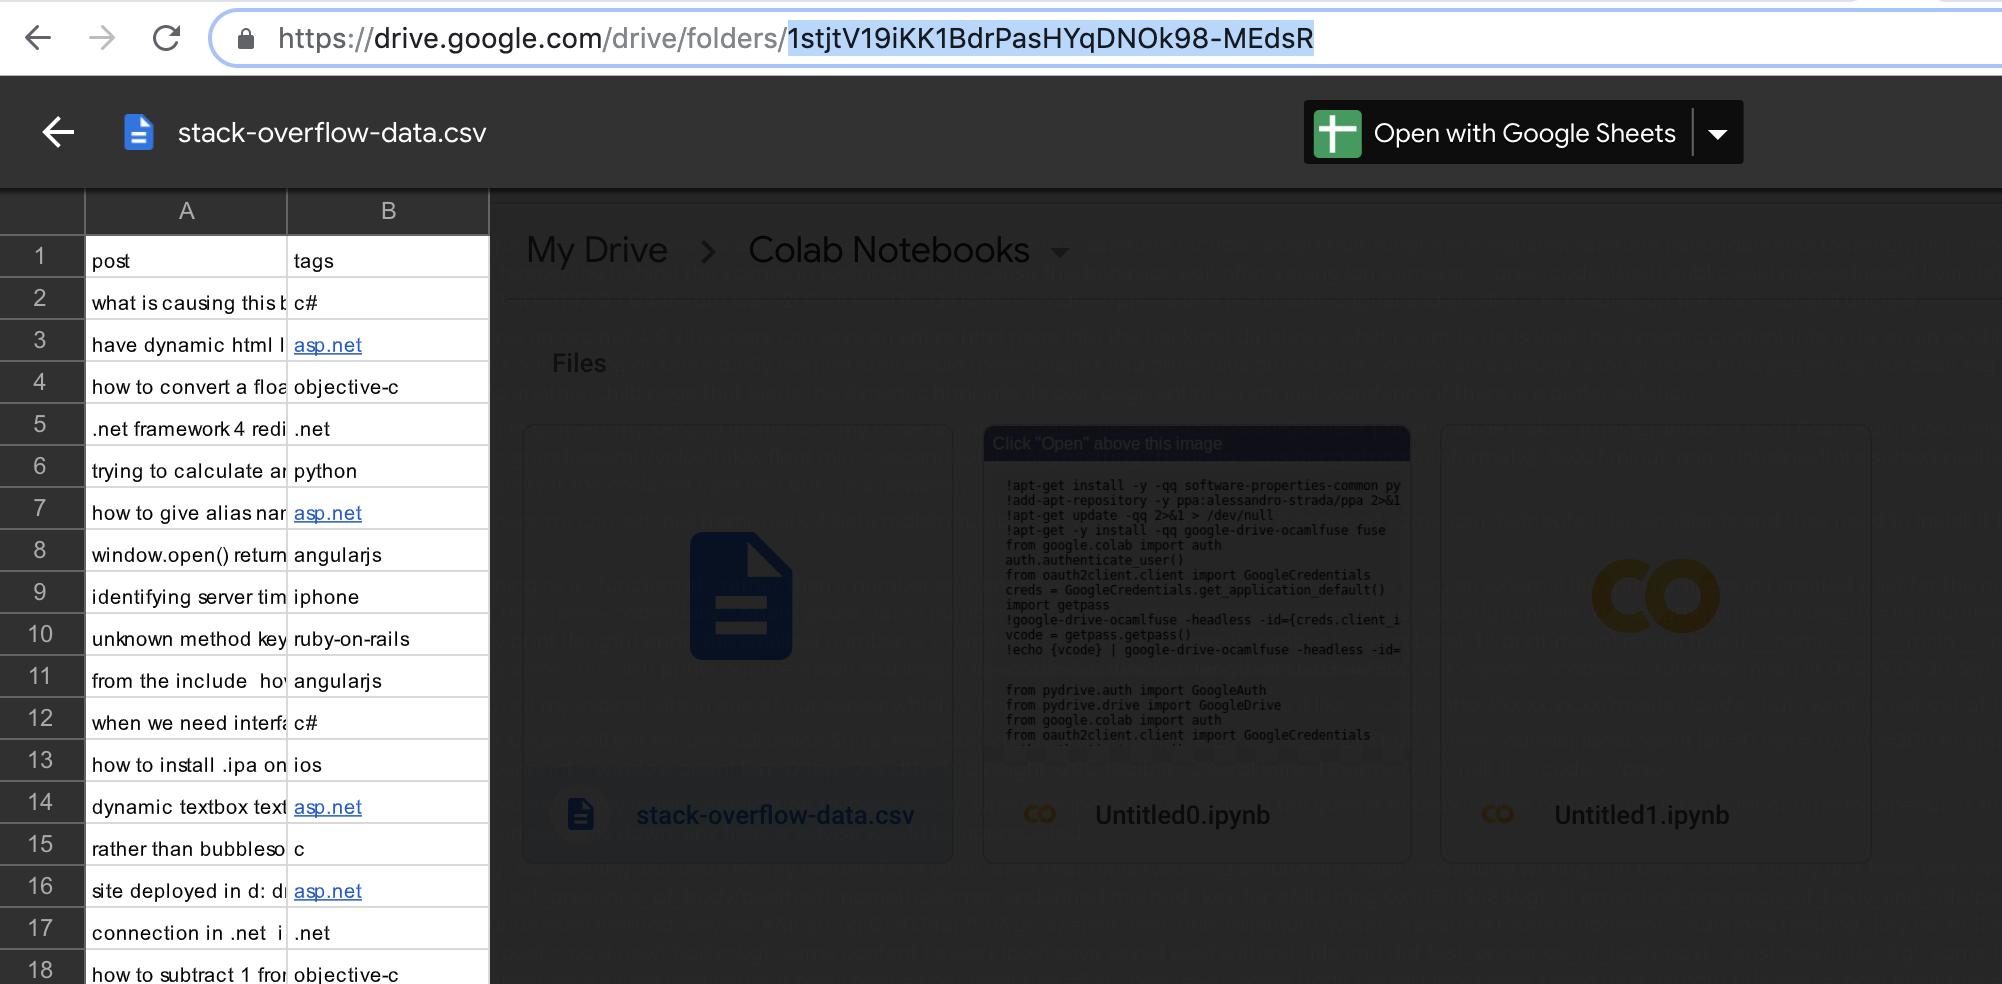 get id of folder